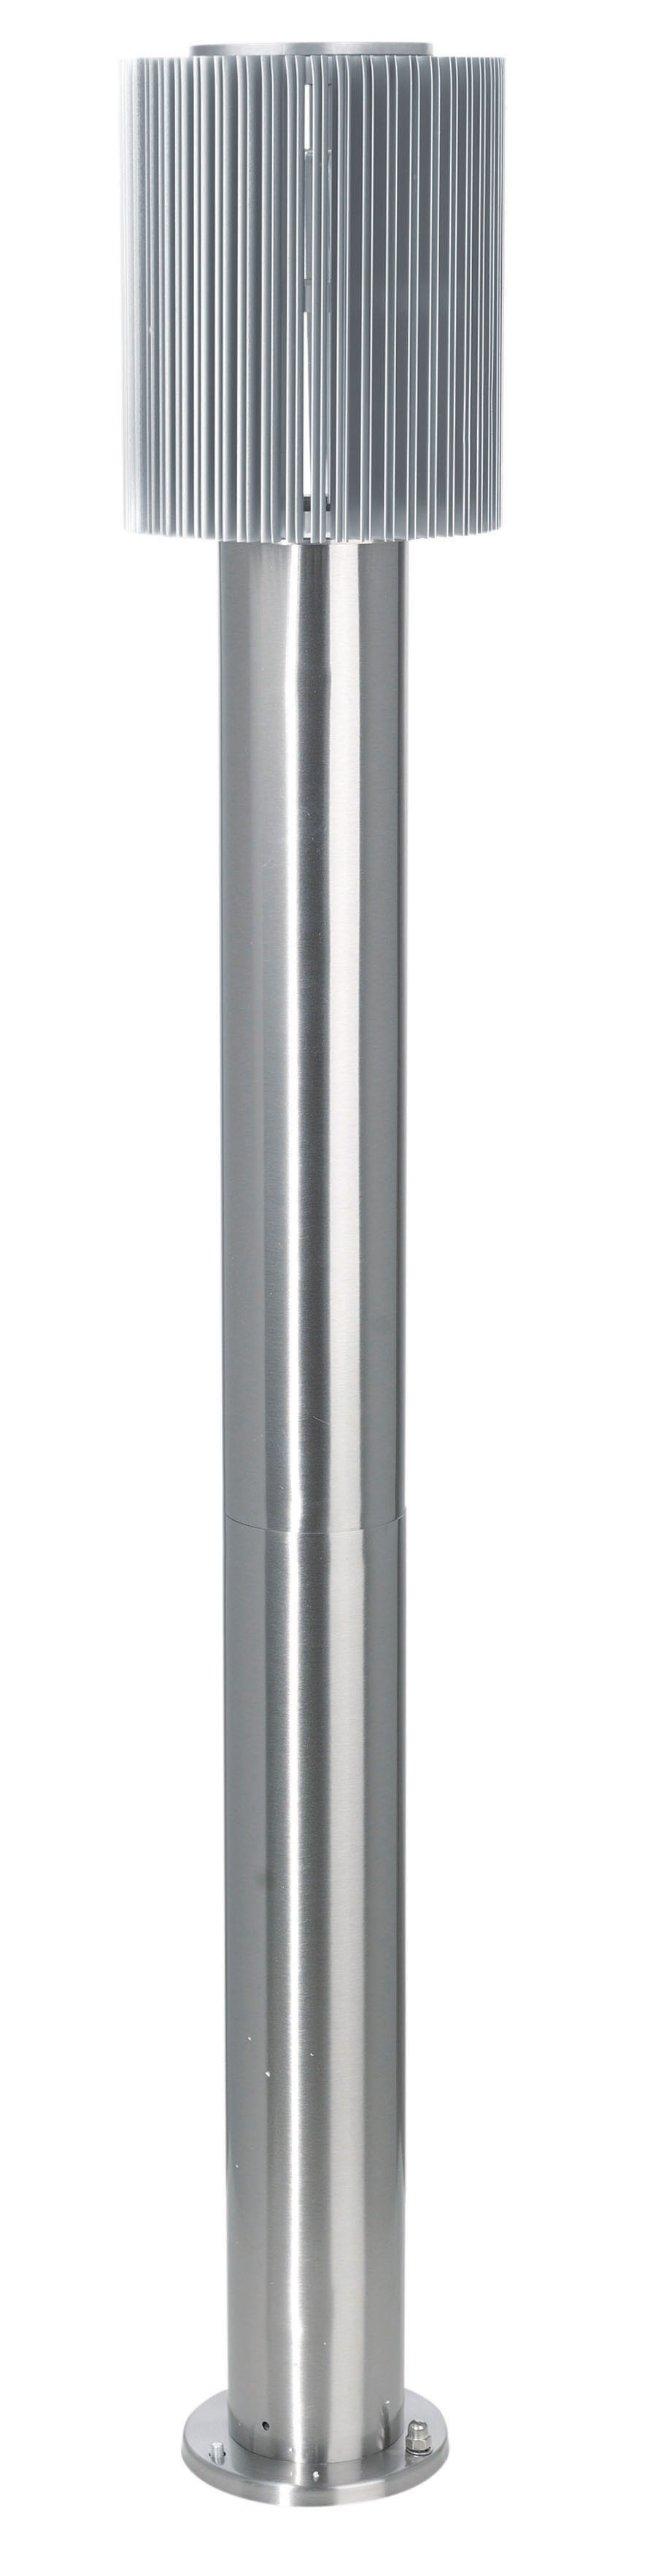 Eglo 89575A Maronello Floor Lamp, Aluminum by Eglo